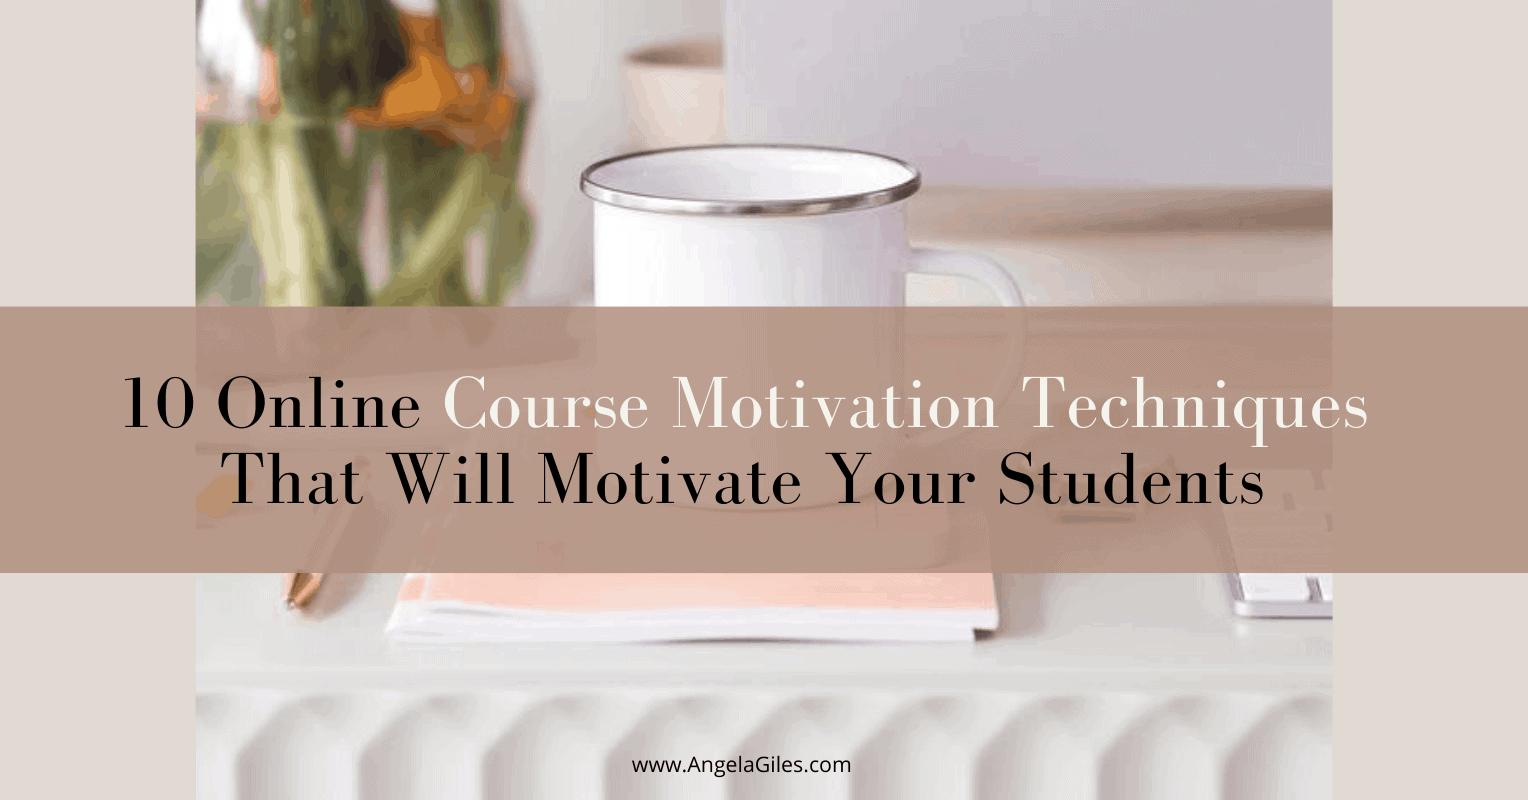 10 Online Course Motivation Techniques That Will Motivate Your Students